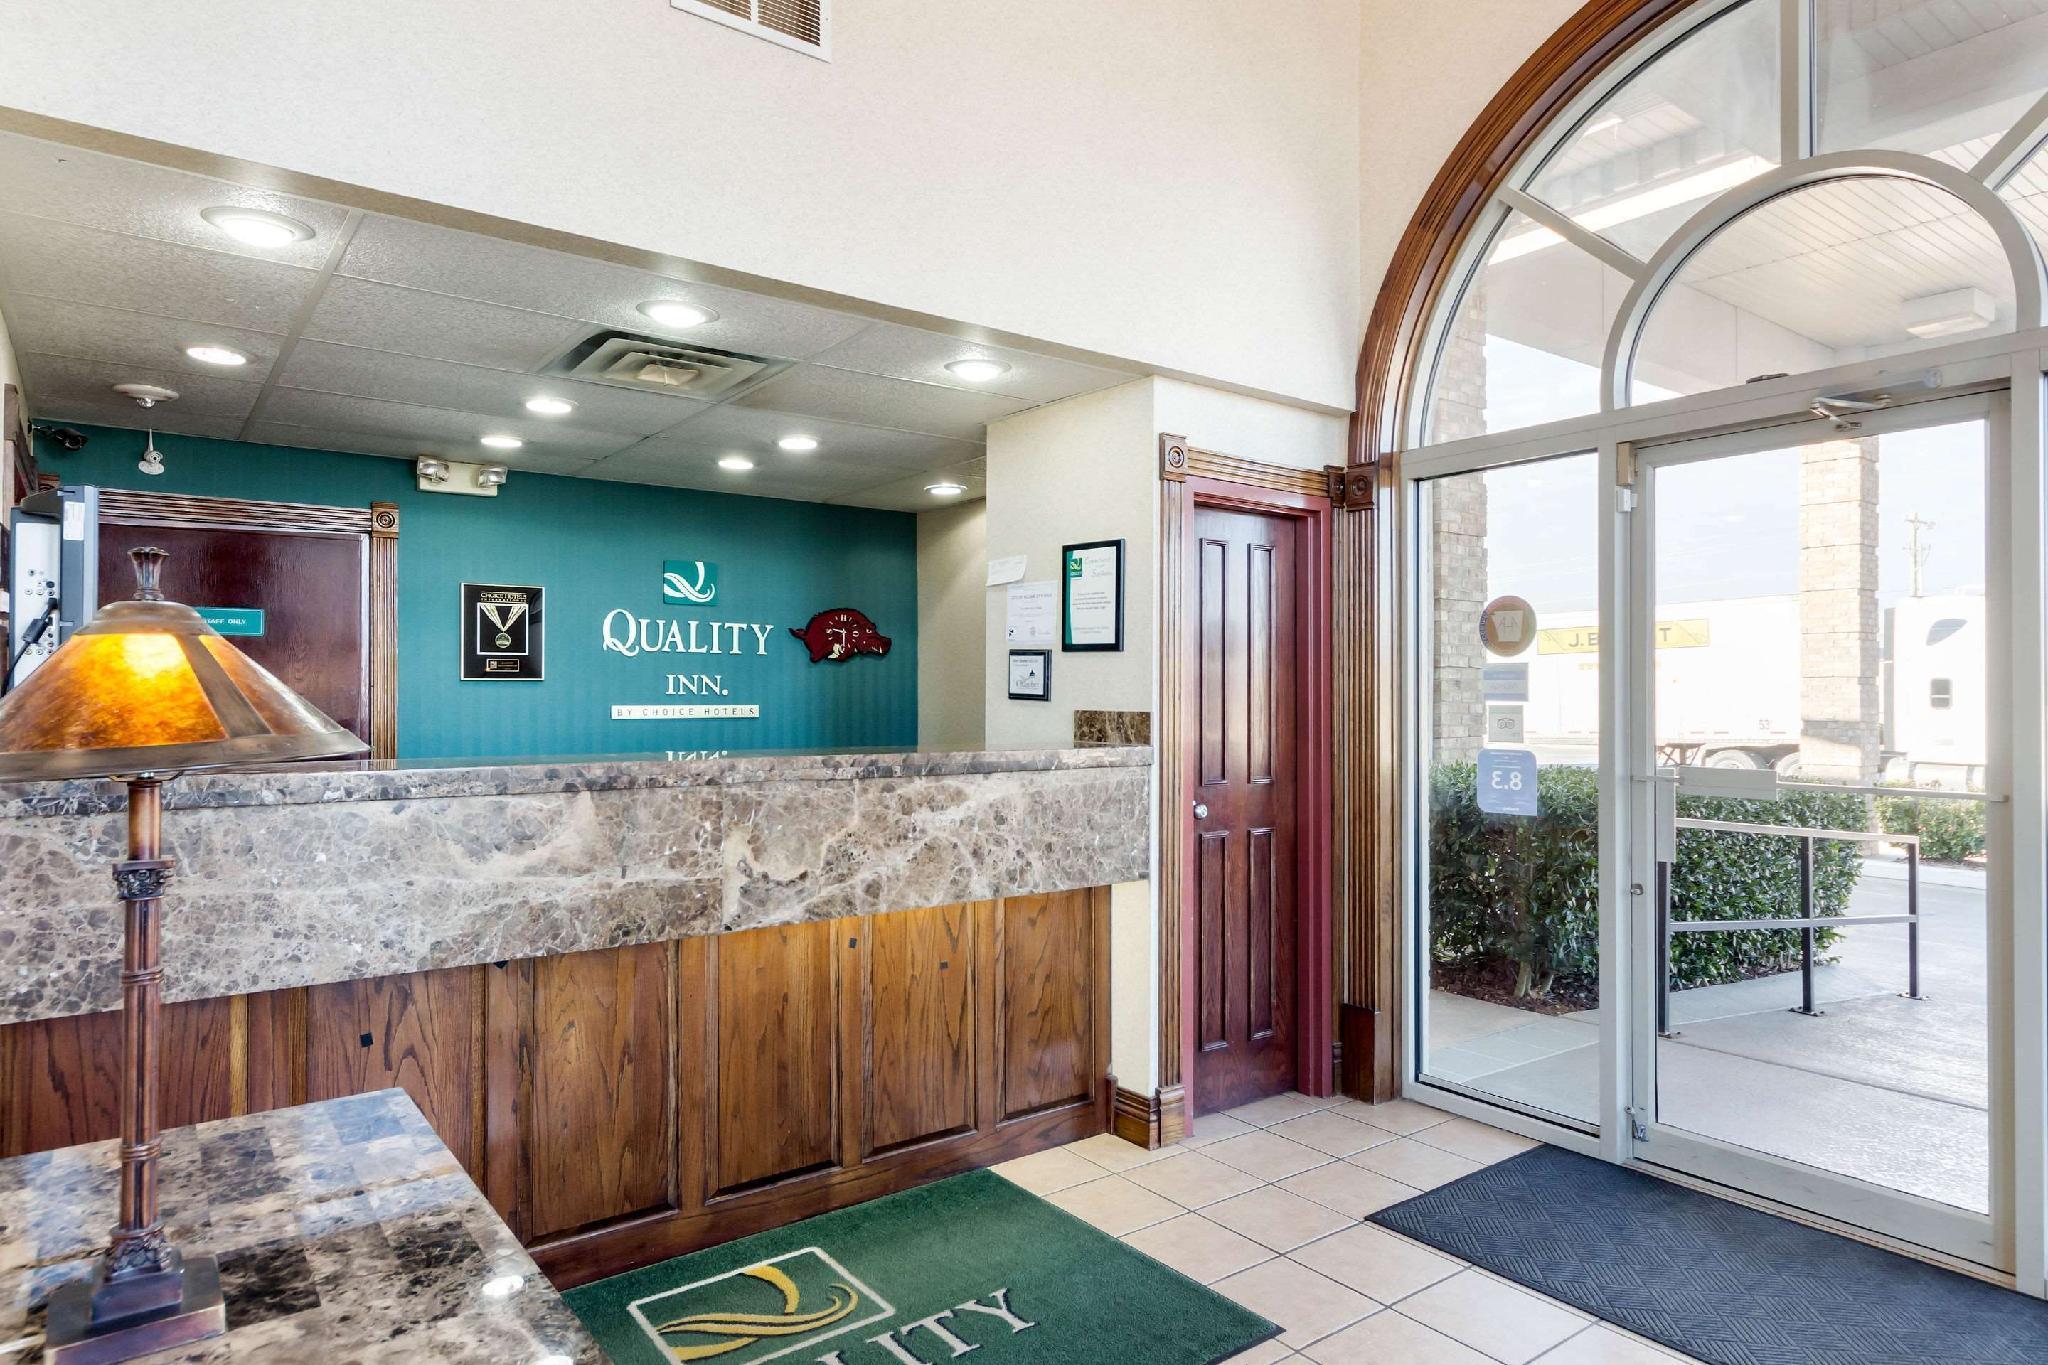 Price Quality Inn